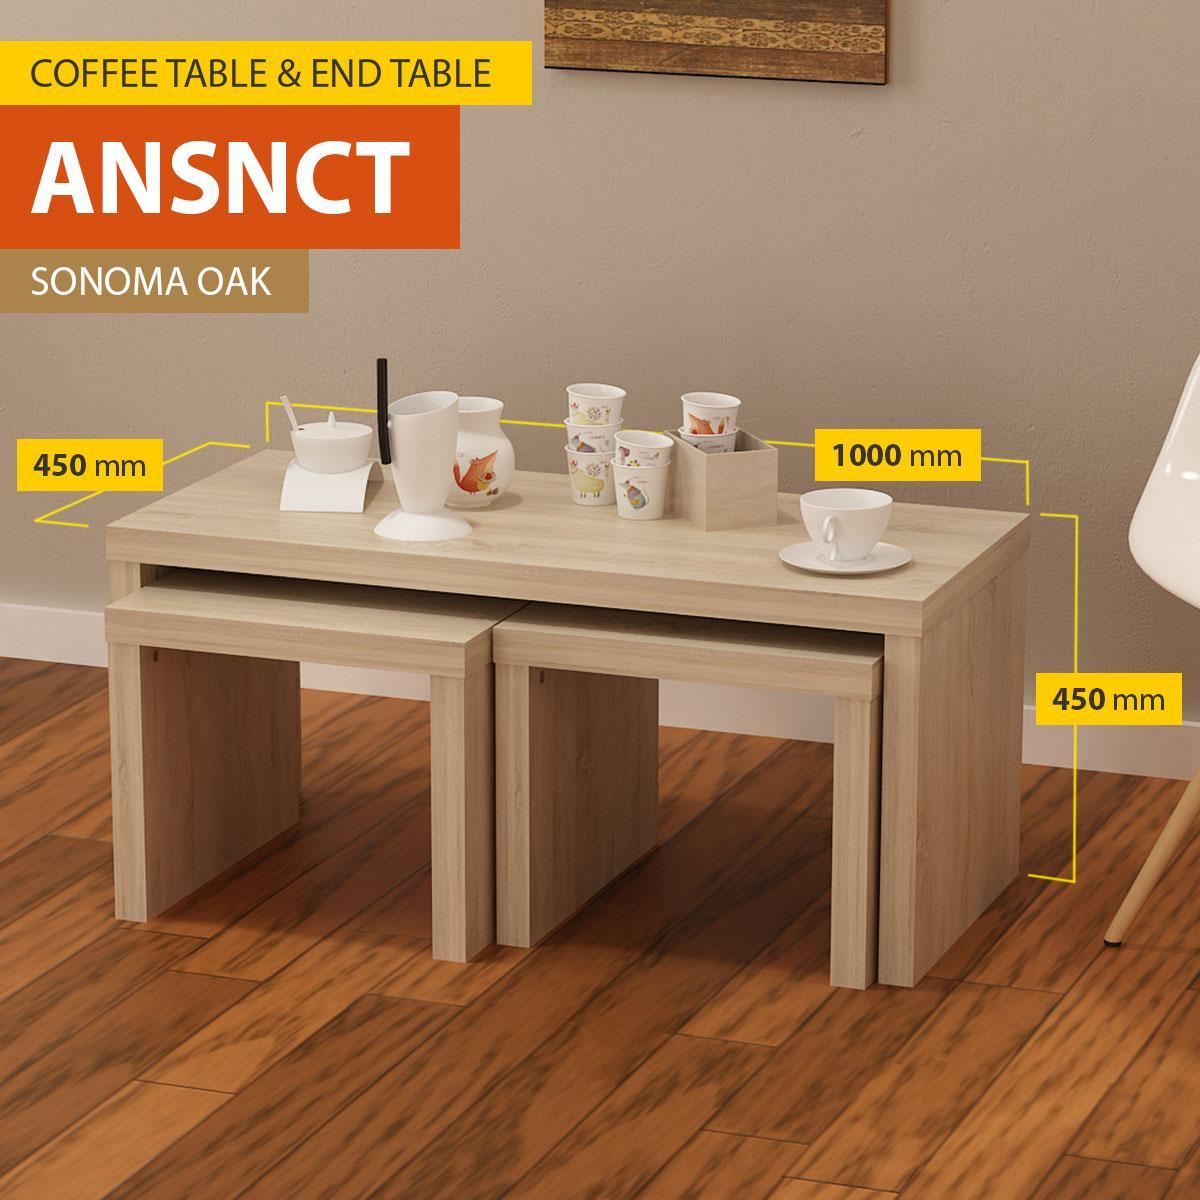 Jual Furnitur Pro Design Terlengkap Roma Sideboard 2 Pintu 3 Laci Espresso Coffe Table Ansi Ansnct New Item